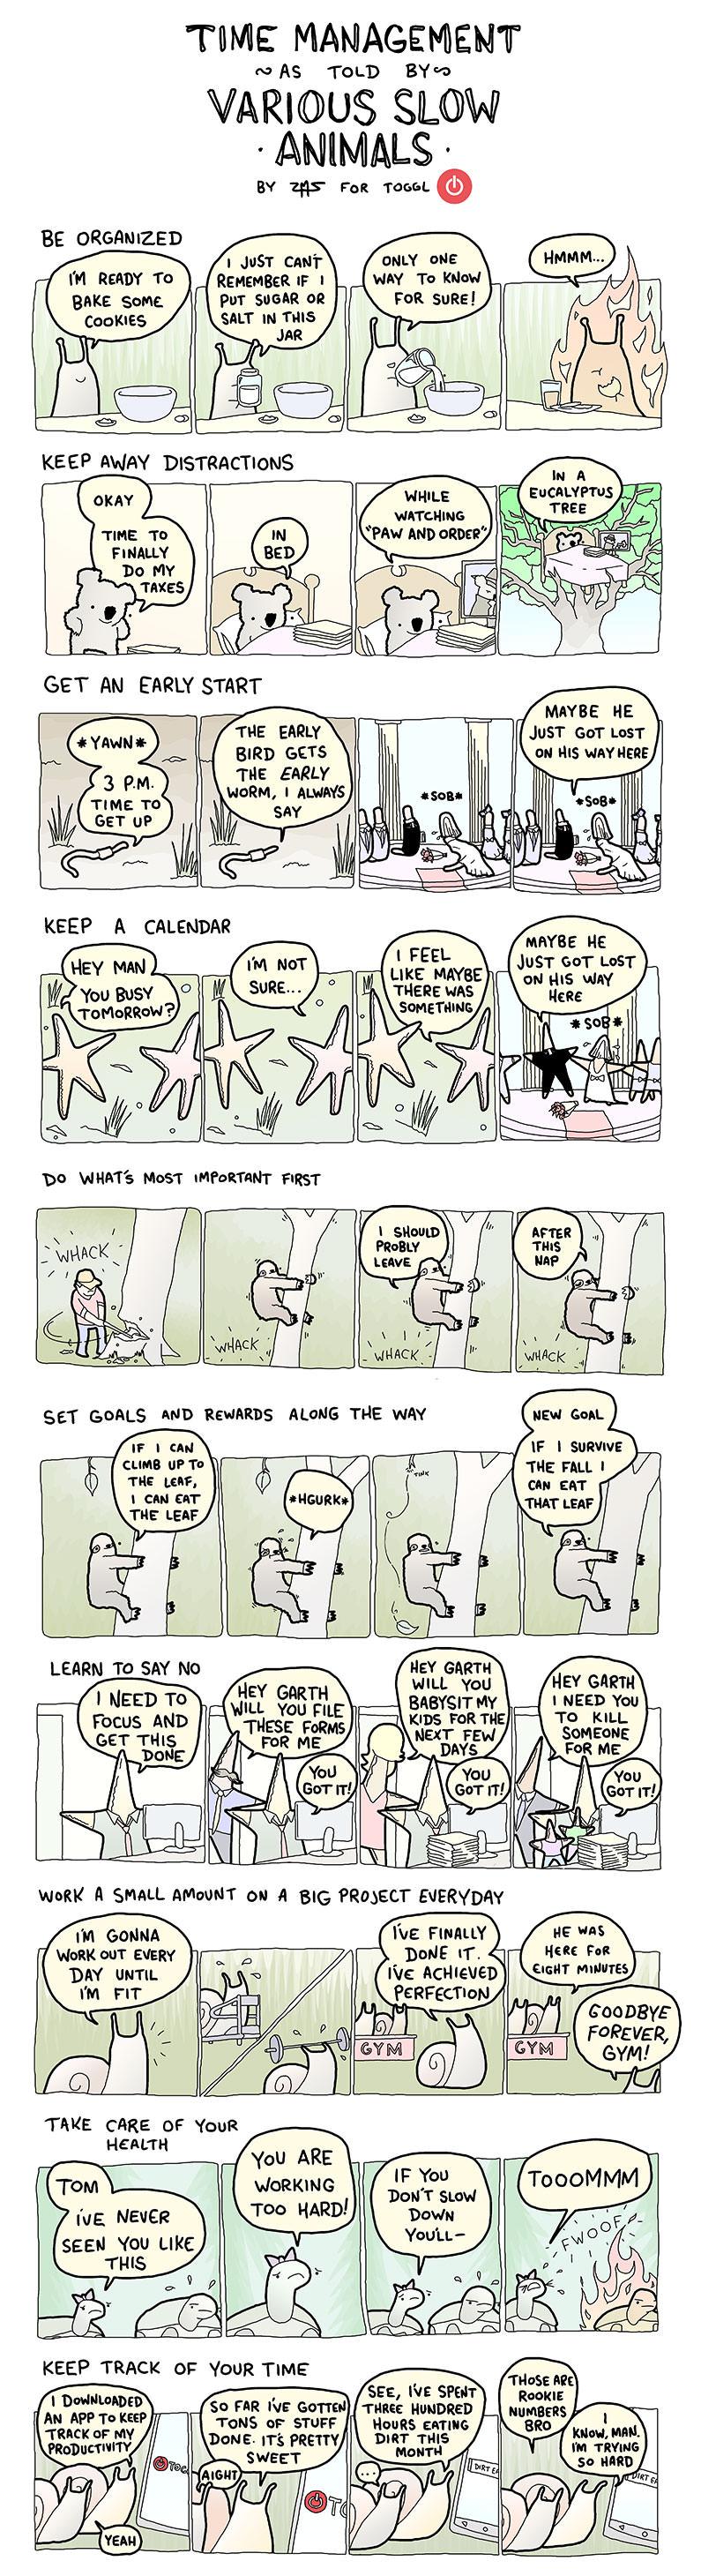 time management-slow-animals-2